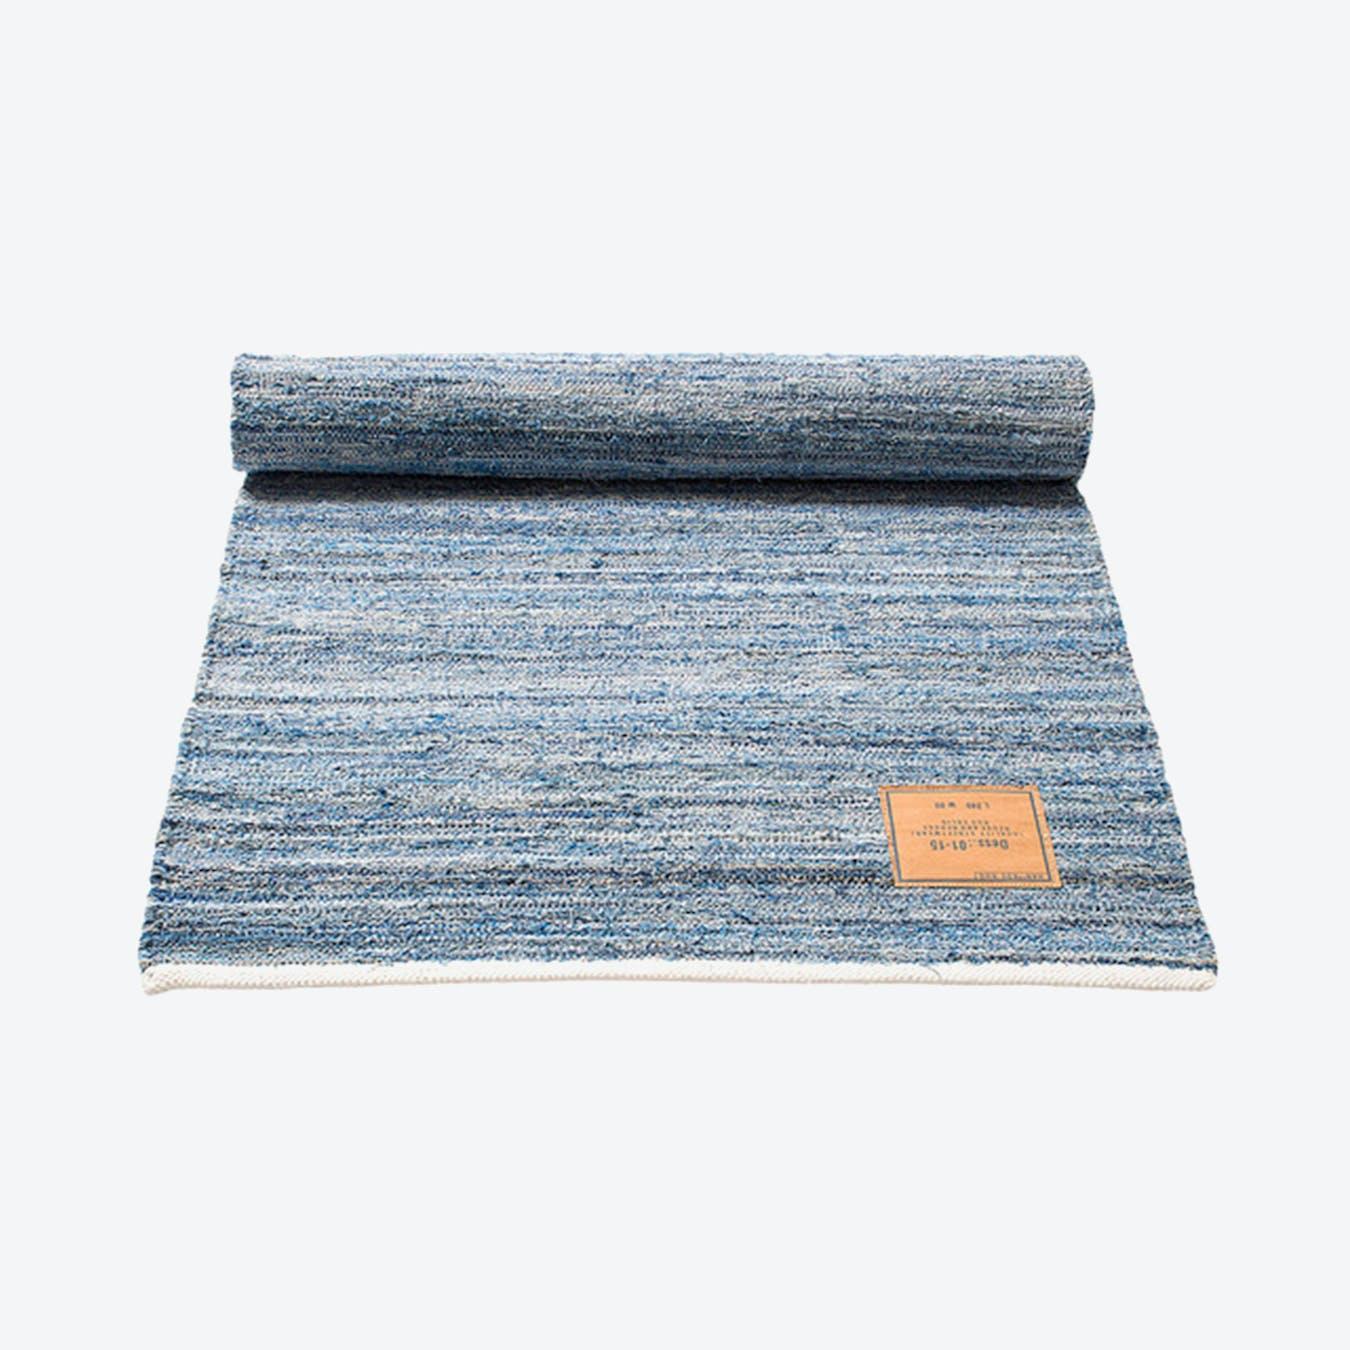 Jeans Rug (80 x 240 cm)